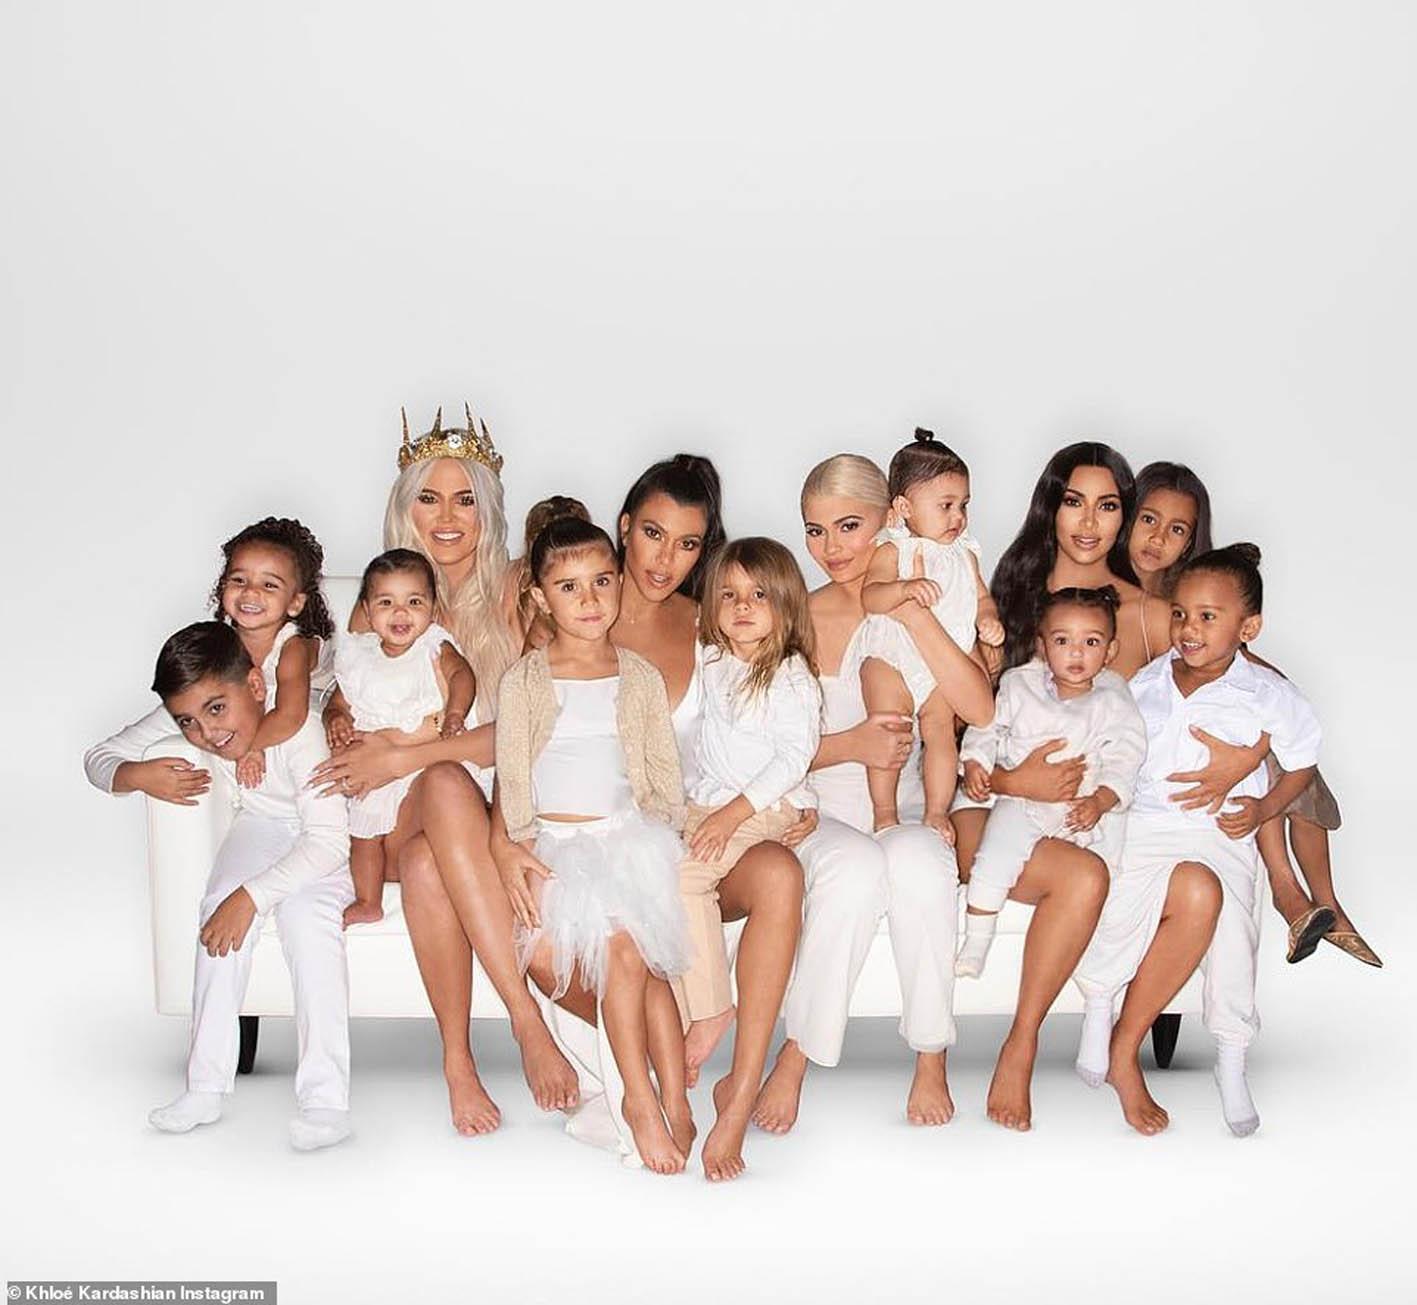 The Kardashian Christmas Card 2021 Er Where S The Kardashian Christmas Card Celebs Cosmopolitan Middle East